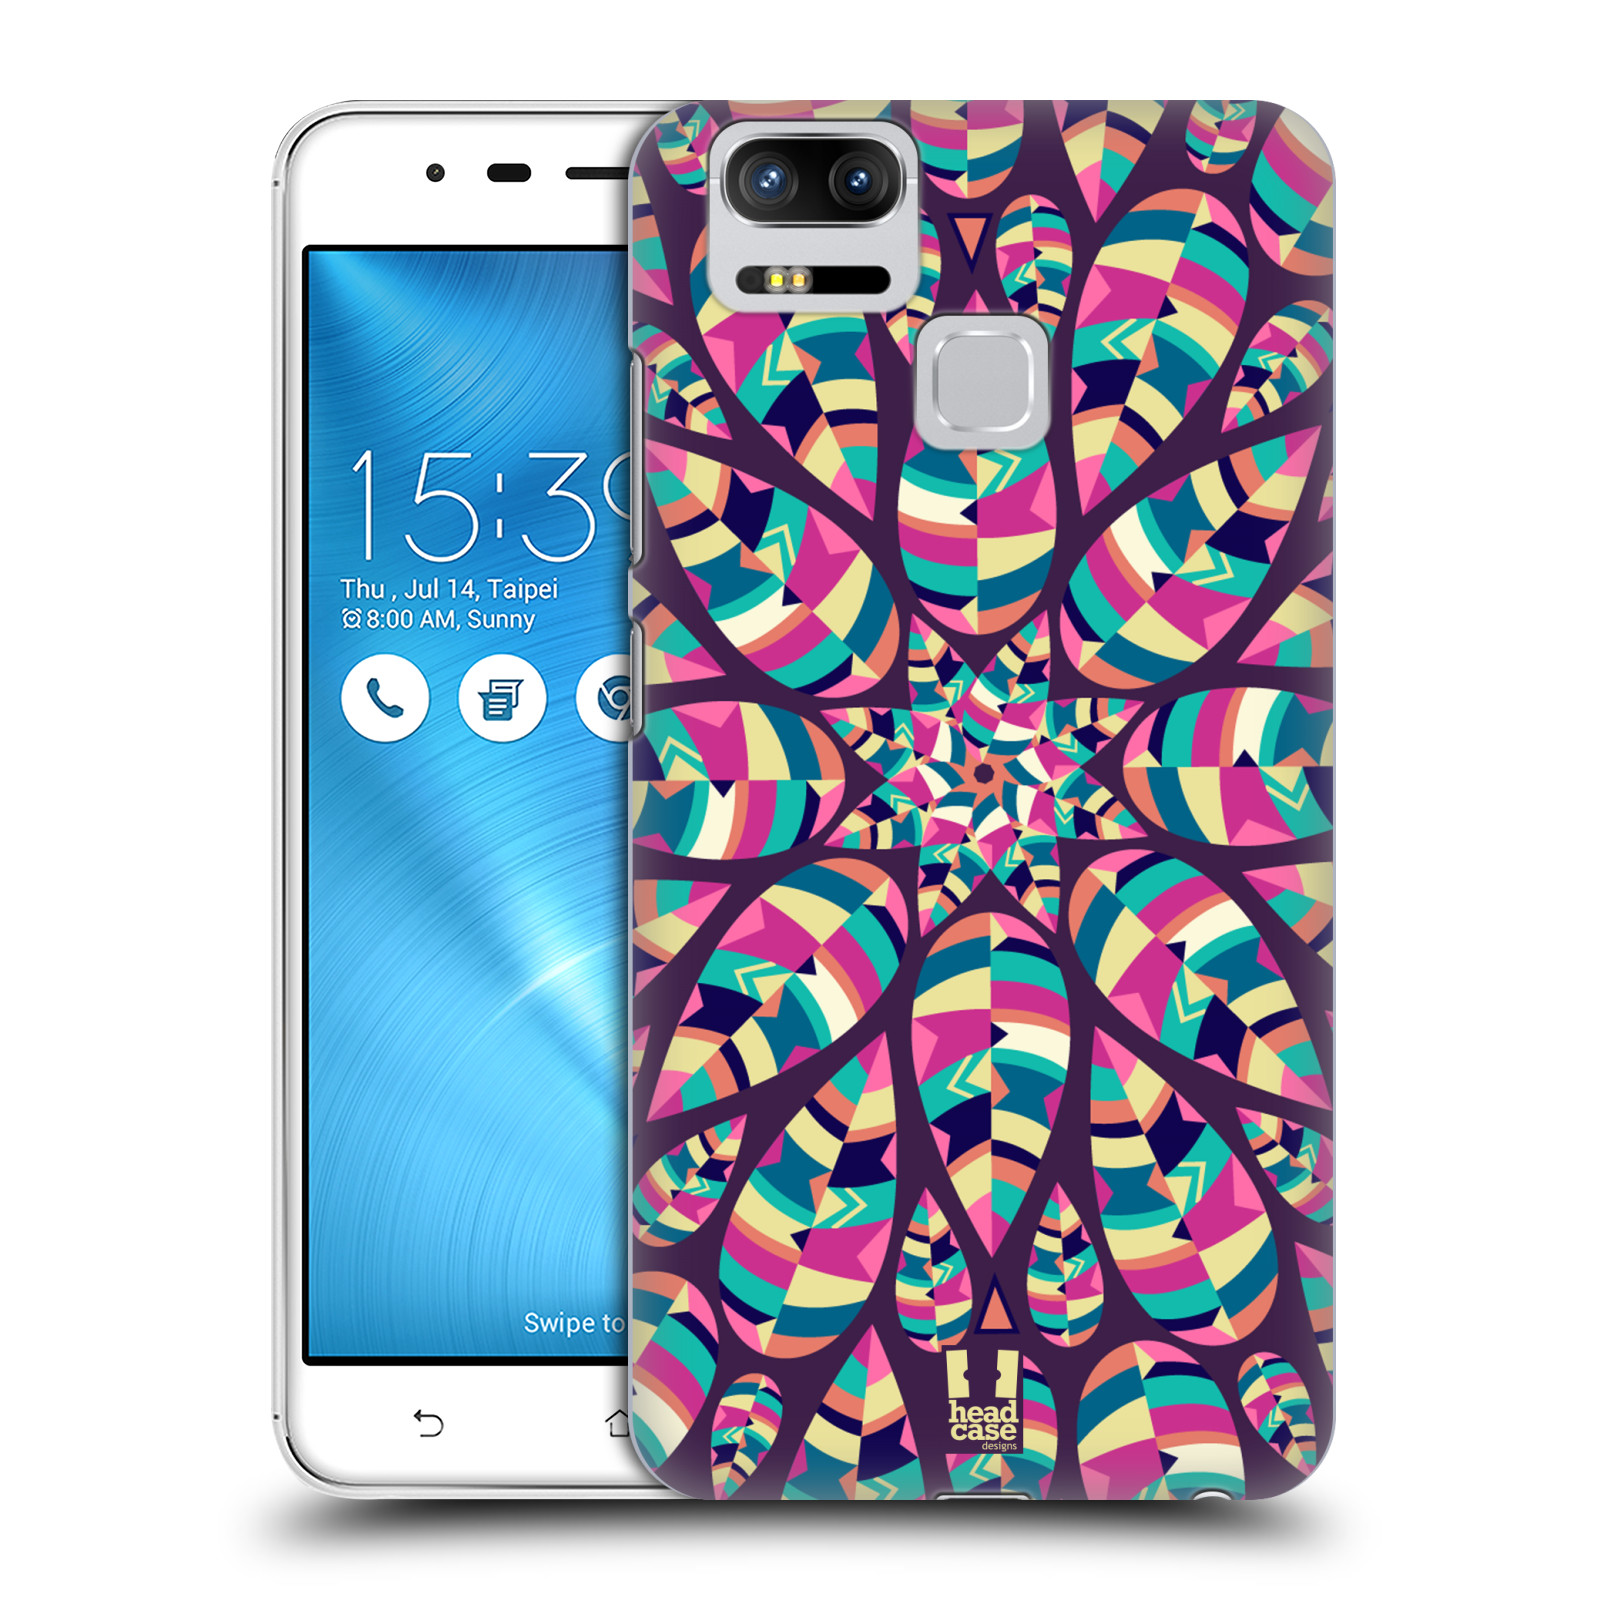 Plastové pouzdro na mobil Asus ZenFone 3 ZOOM ZE553KL - Head Case - Shine (Plastový kryt či obal na mobilní telefon Asus ZenFone 3 ZOOM ZE553KL s motivem Shine)